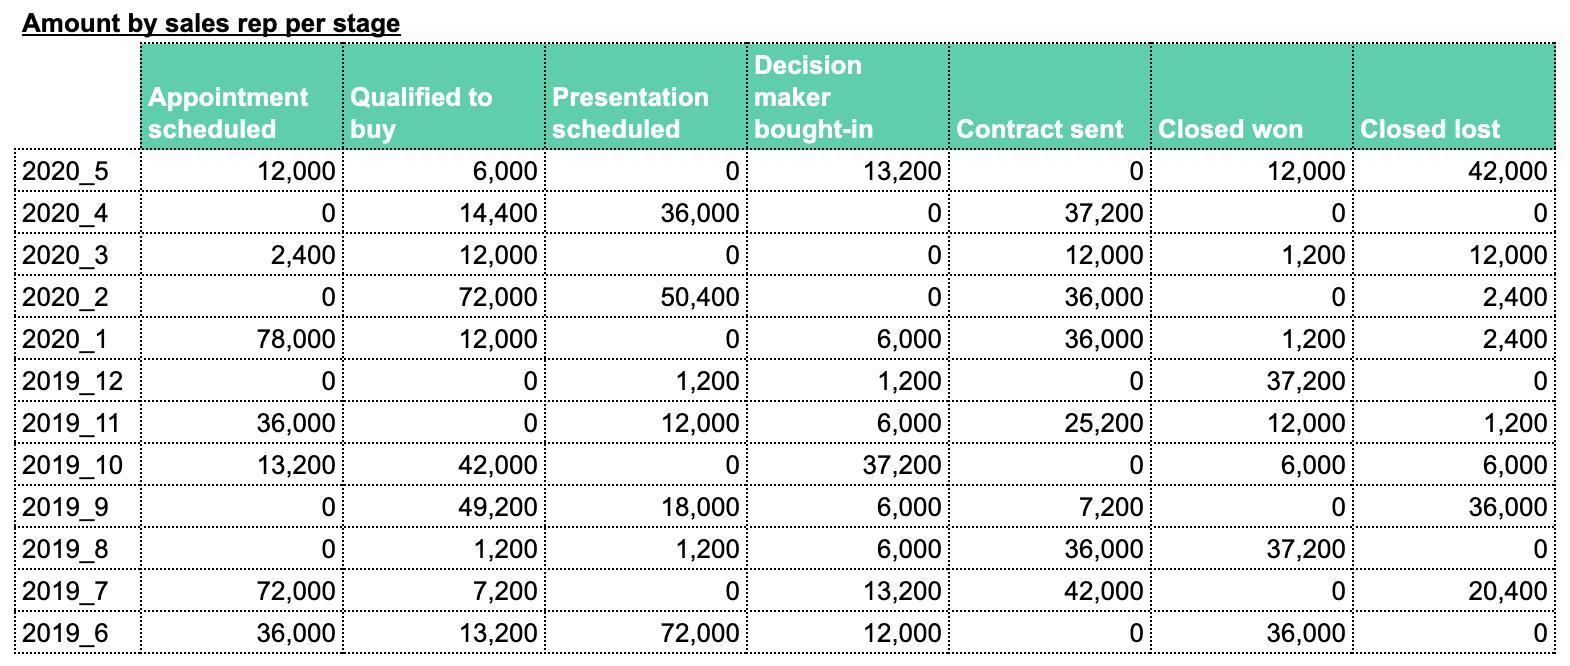 Sales metrics Hubspot Google sheets amount per stage/rep